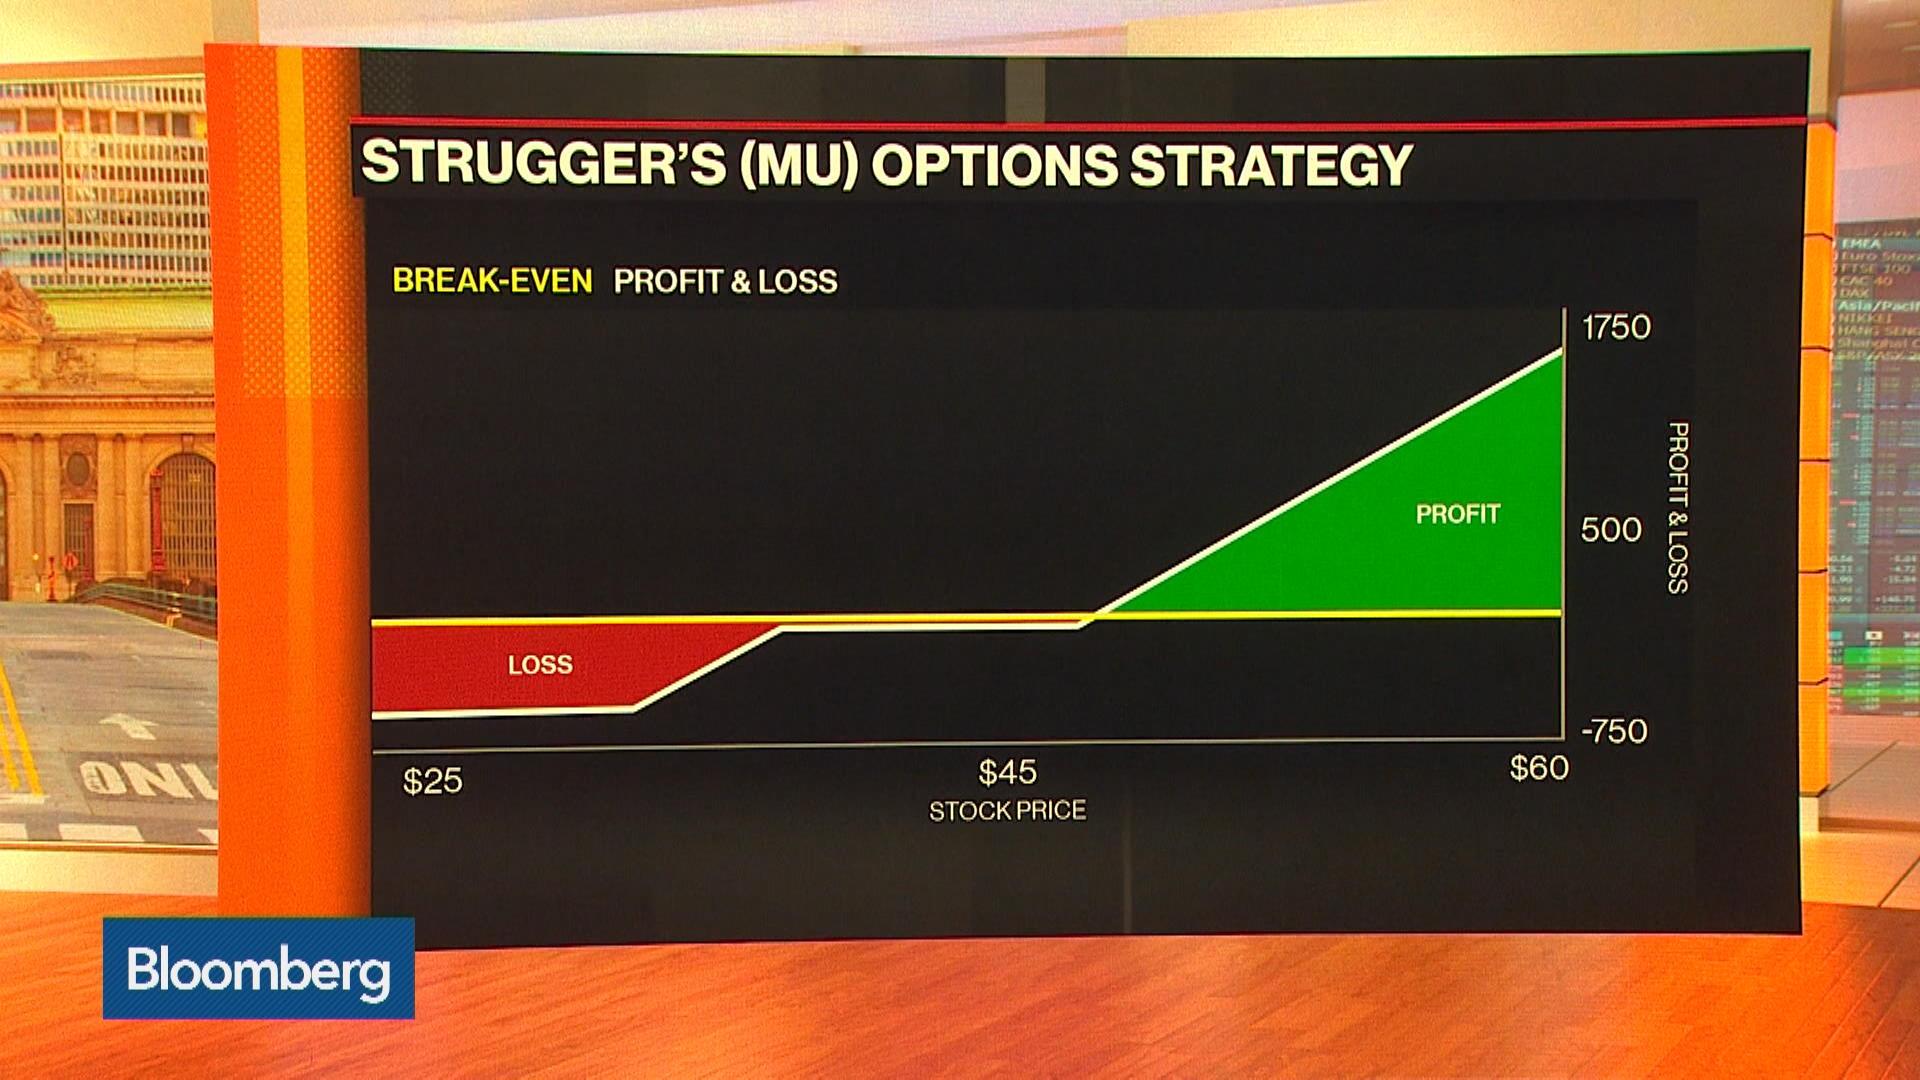 MU:NASDAQ GS Stock Quote - Micron Technology Inc - Bloomberg Markets